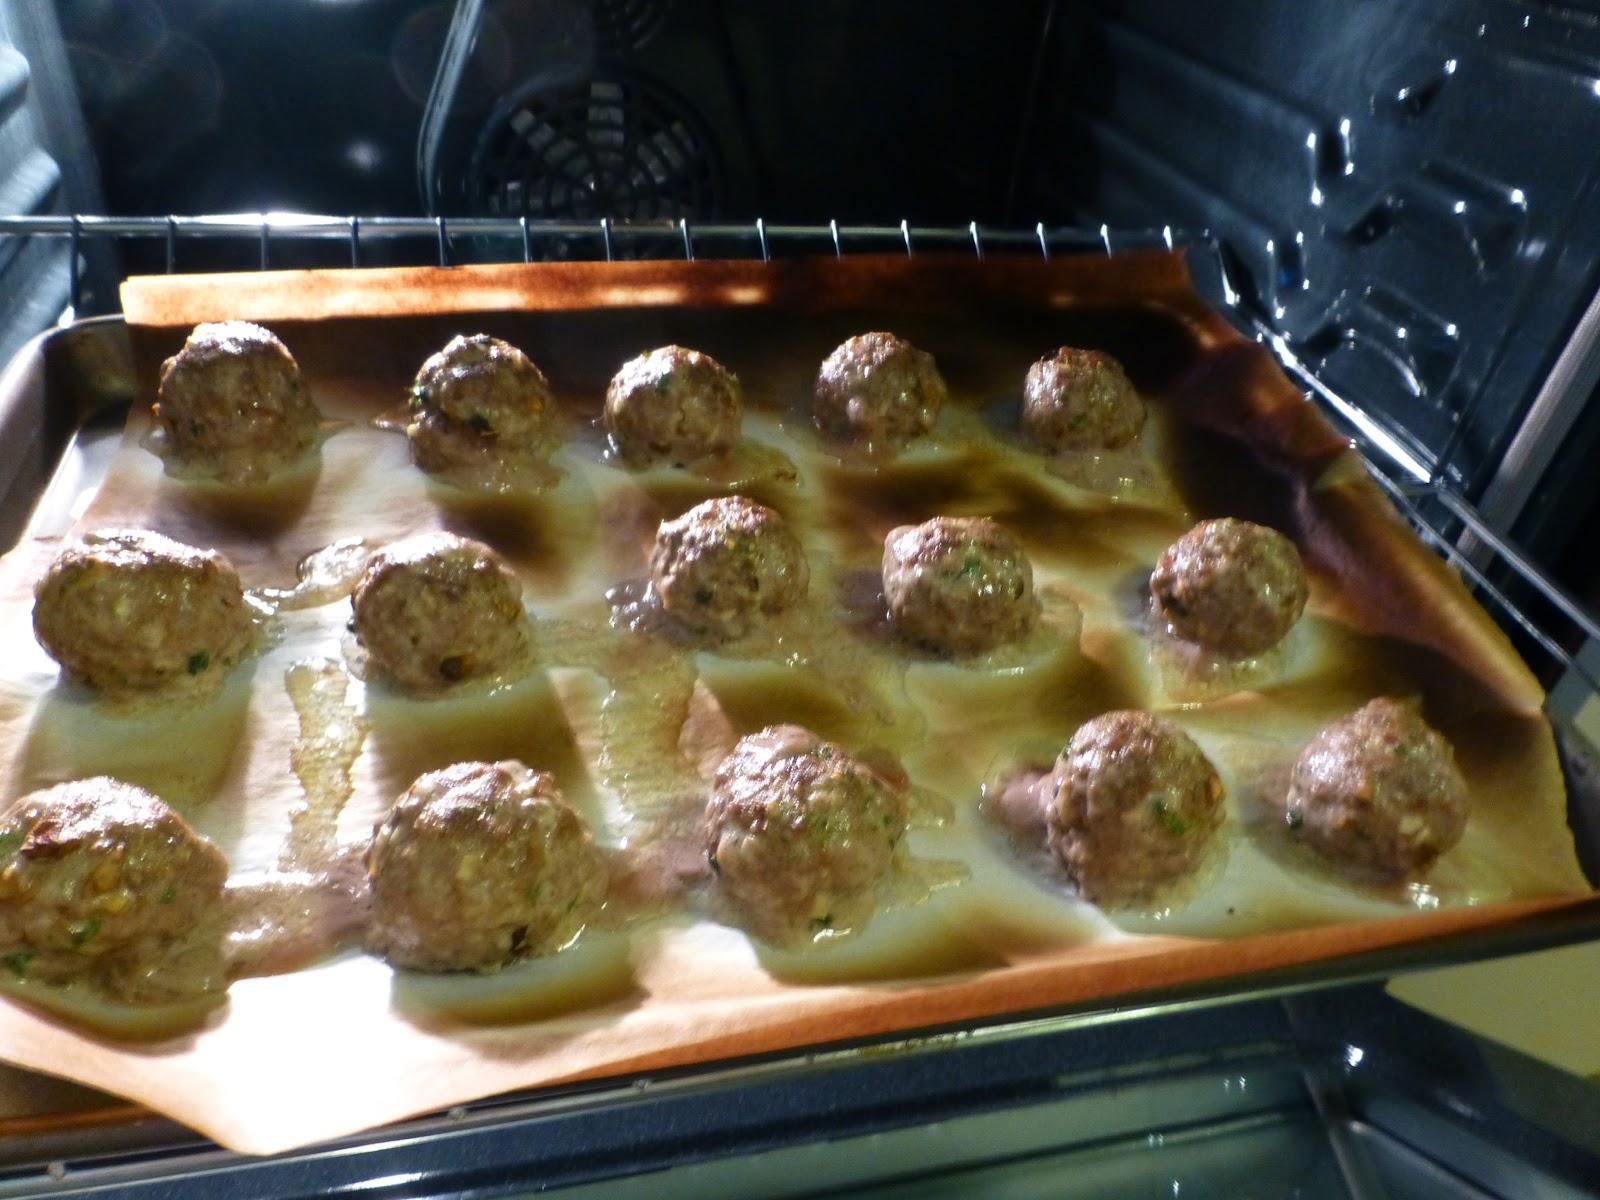 Douglas Kitchen Odyssey: Rosemary Porcini Meatballs with Polenta